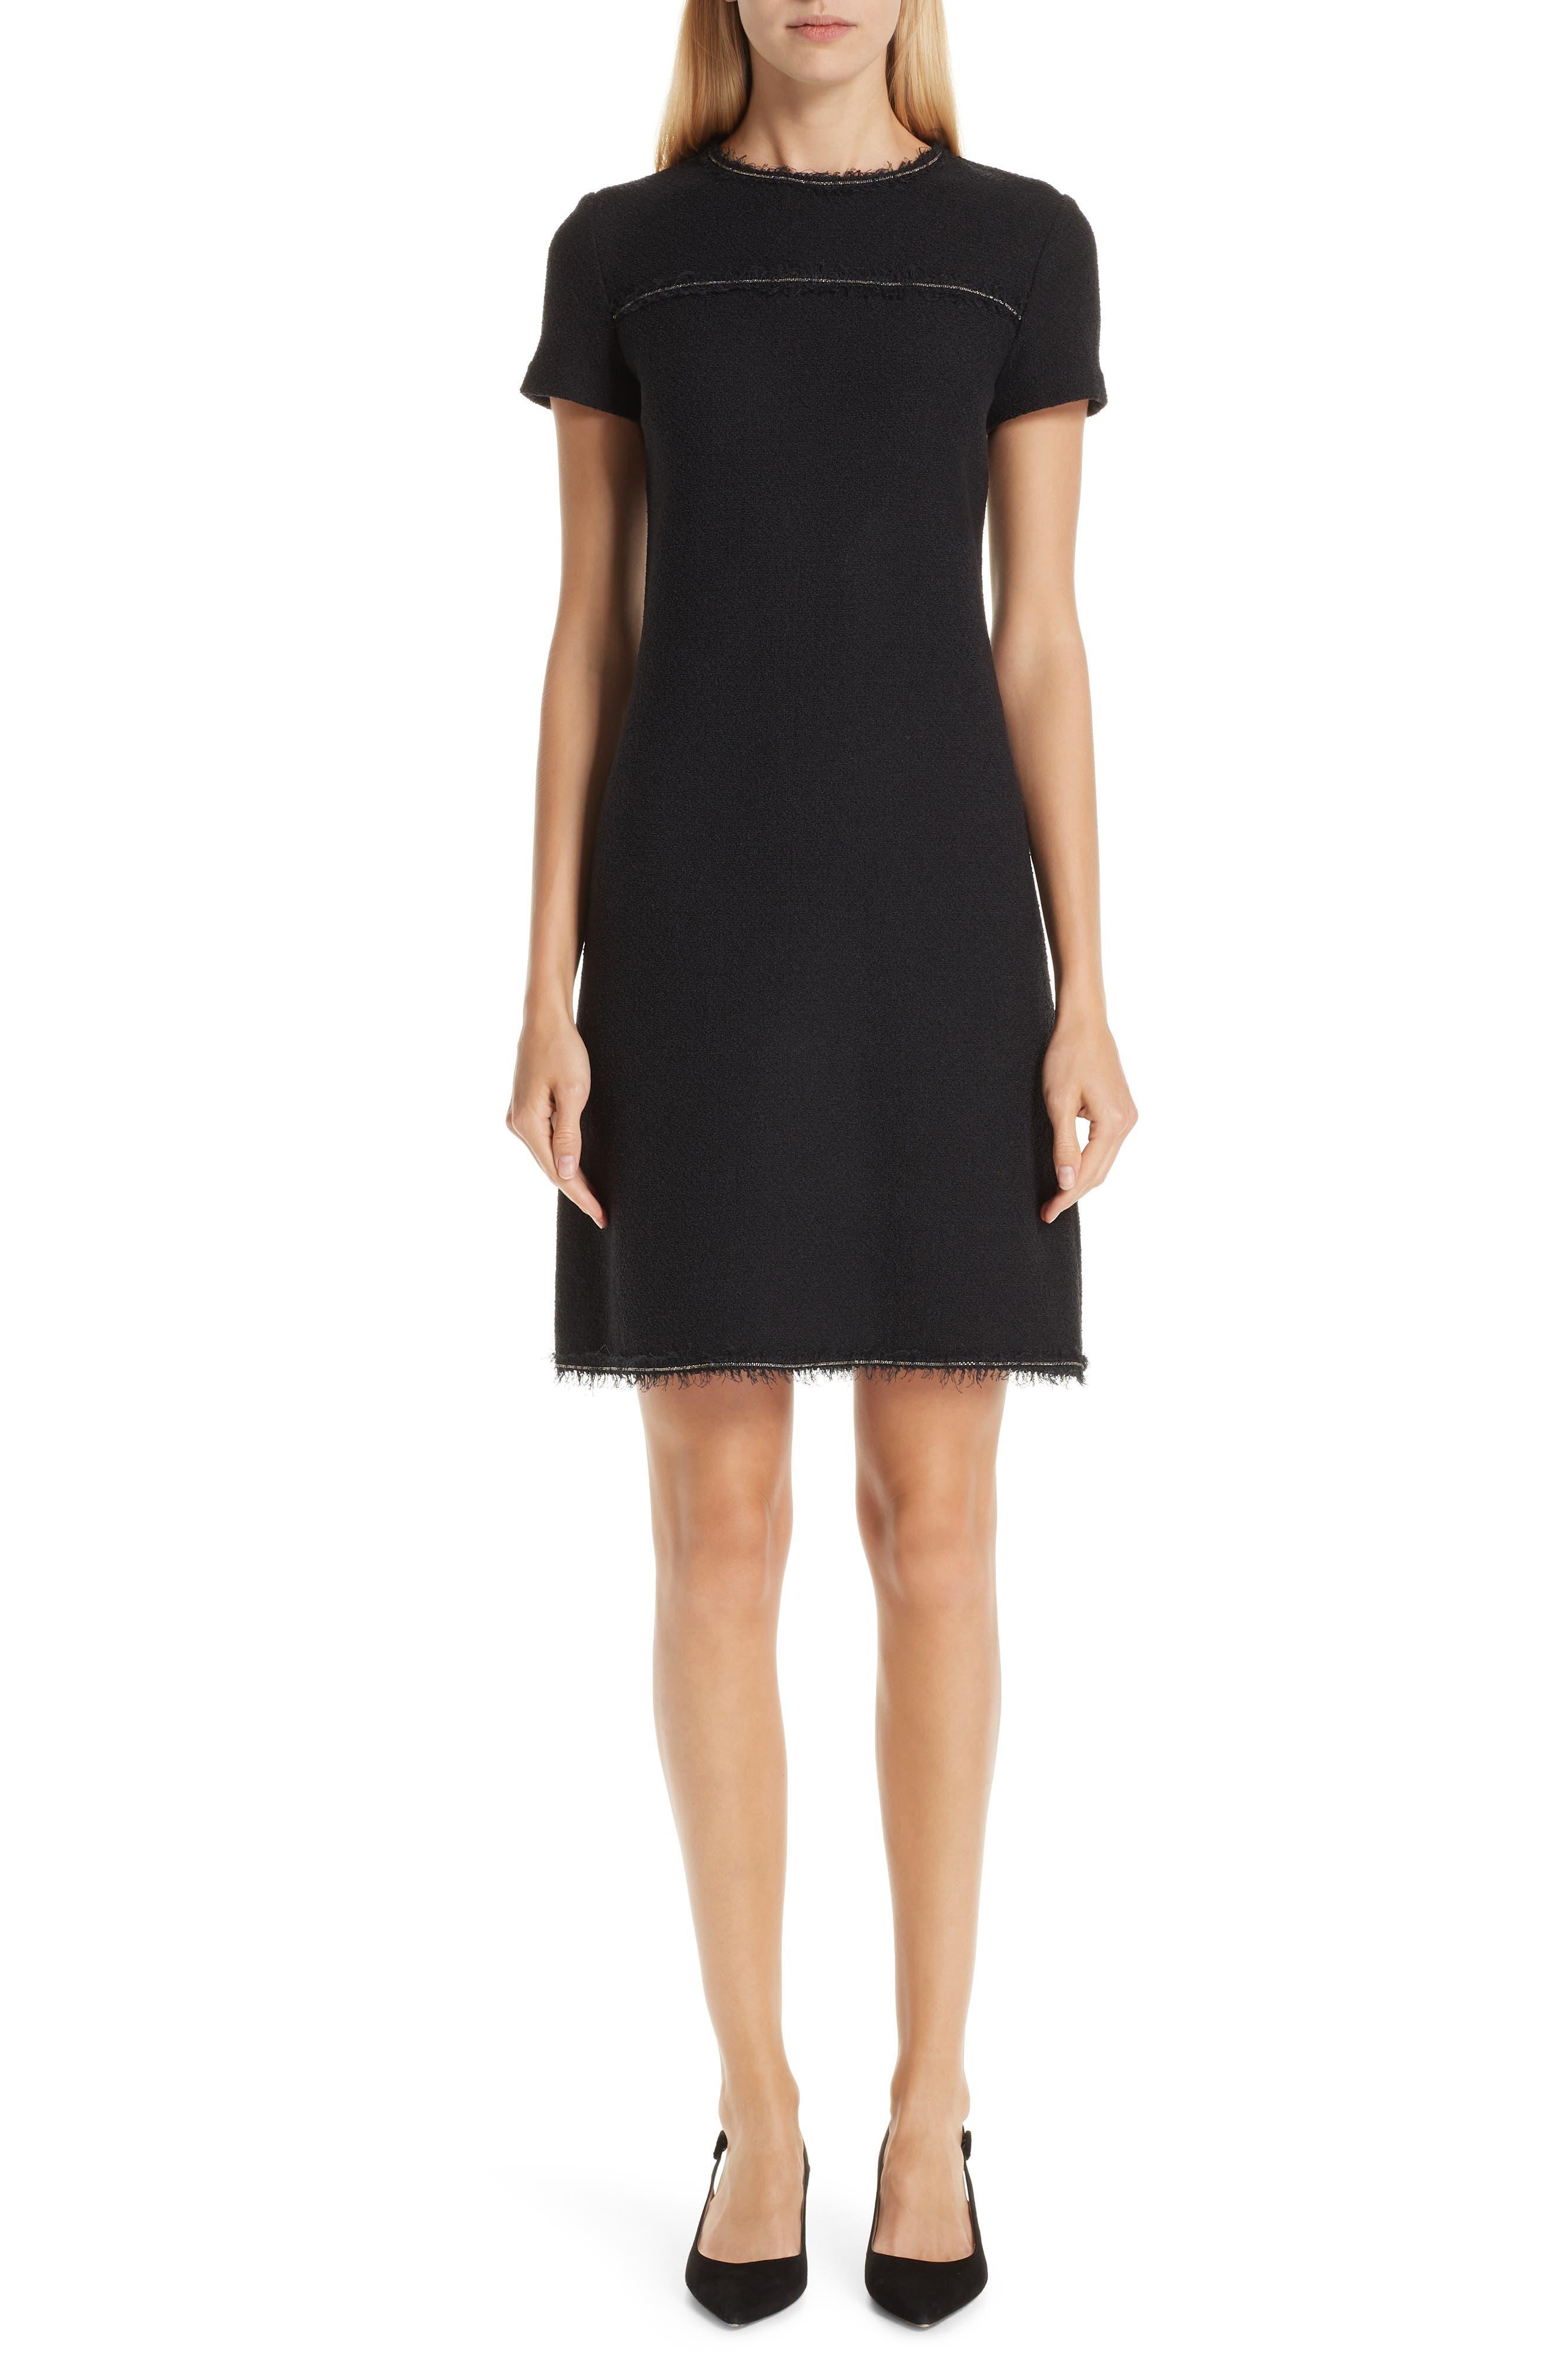 St. John Collection Boucle Knit Dress, Black